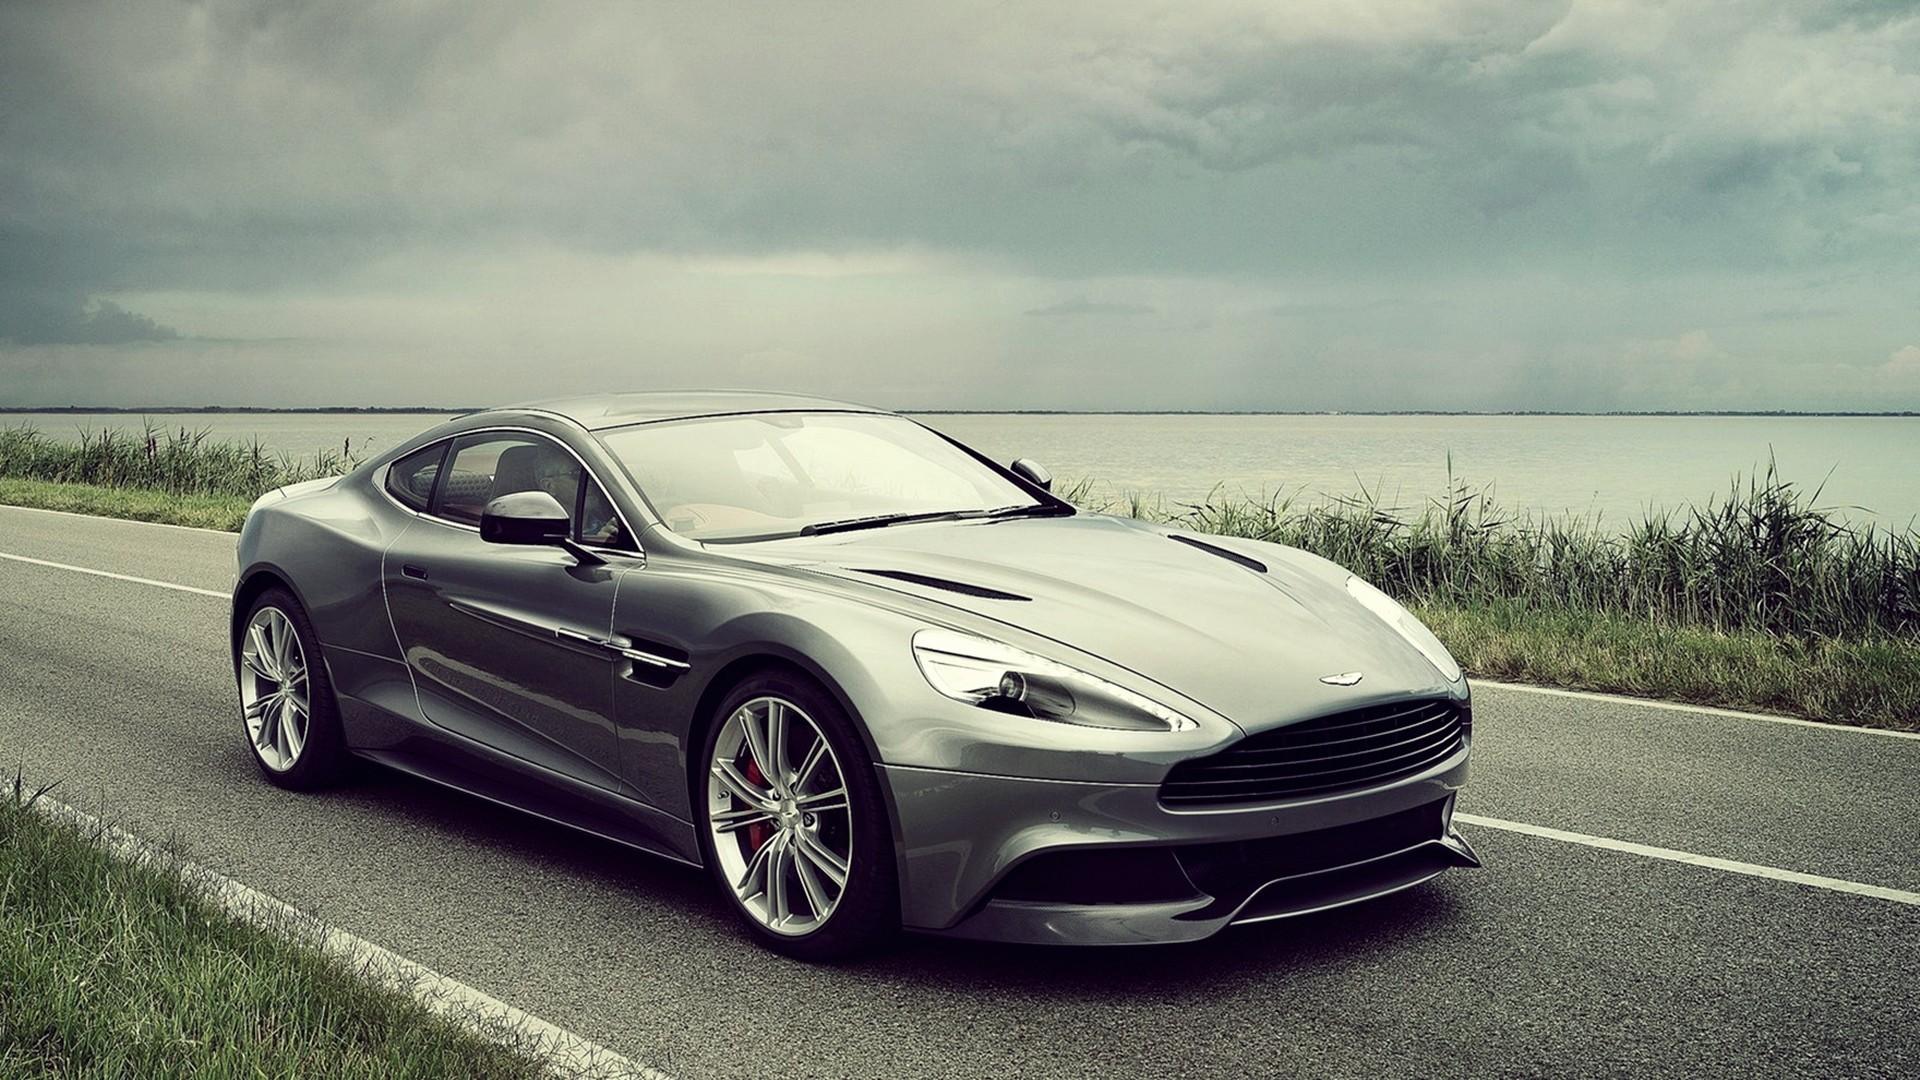 Fondos De Pantalla 1920x1080 Px Aston Martin Vanquish